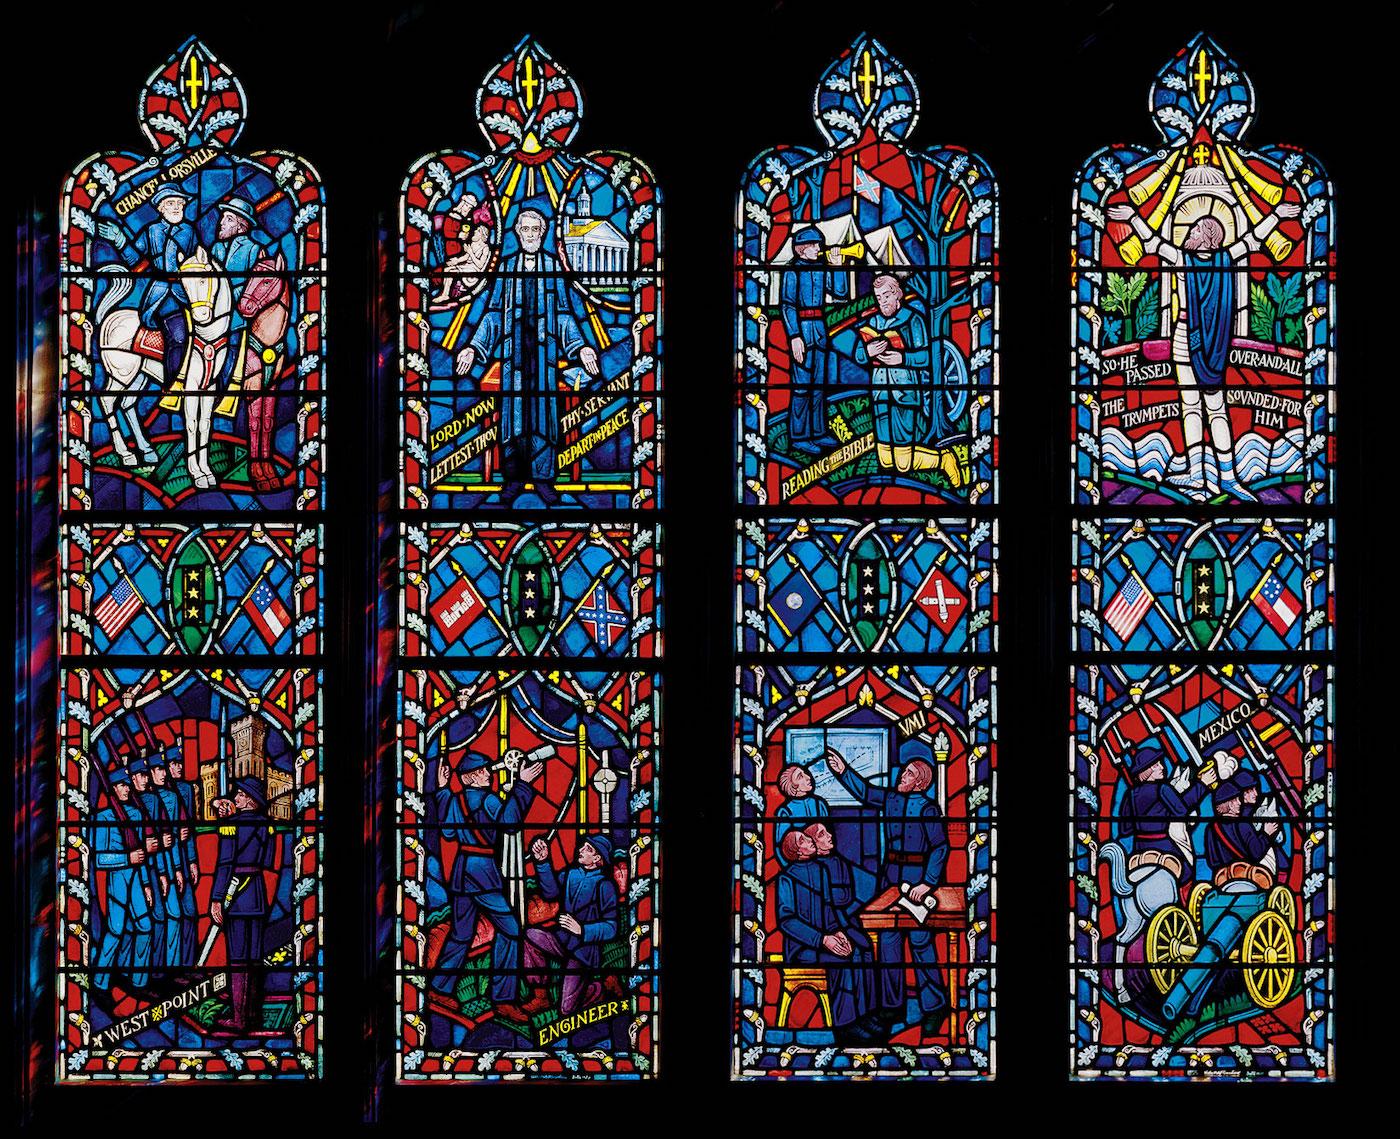 "Stained glass windows memorializing Robert E. Lee and Thomas ""Stonewall Jackson"" (photo courtesy Washington National Cathedral)"